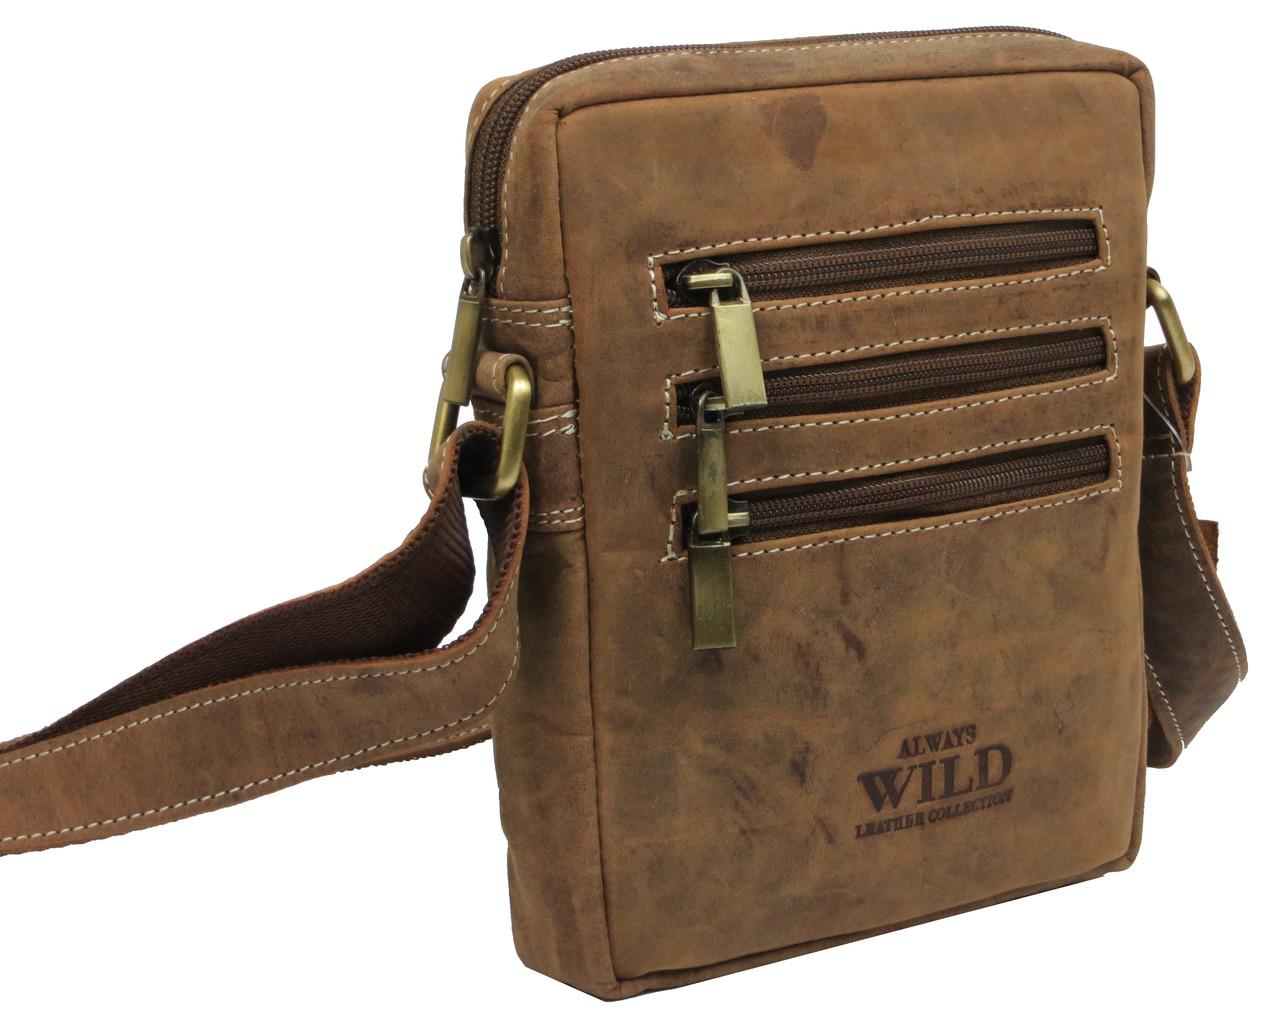 04fe5aee97ea Небольшая кожаная сумка-барсетка Always Wild 250MH коричневая ...